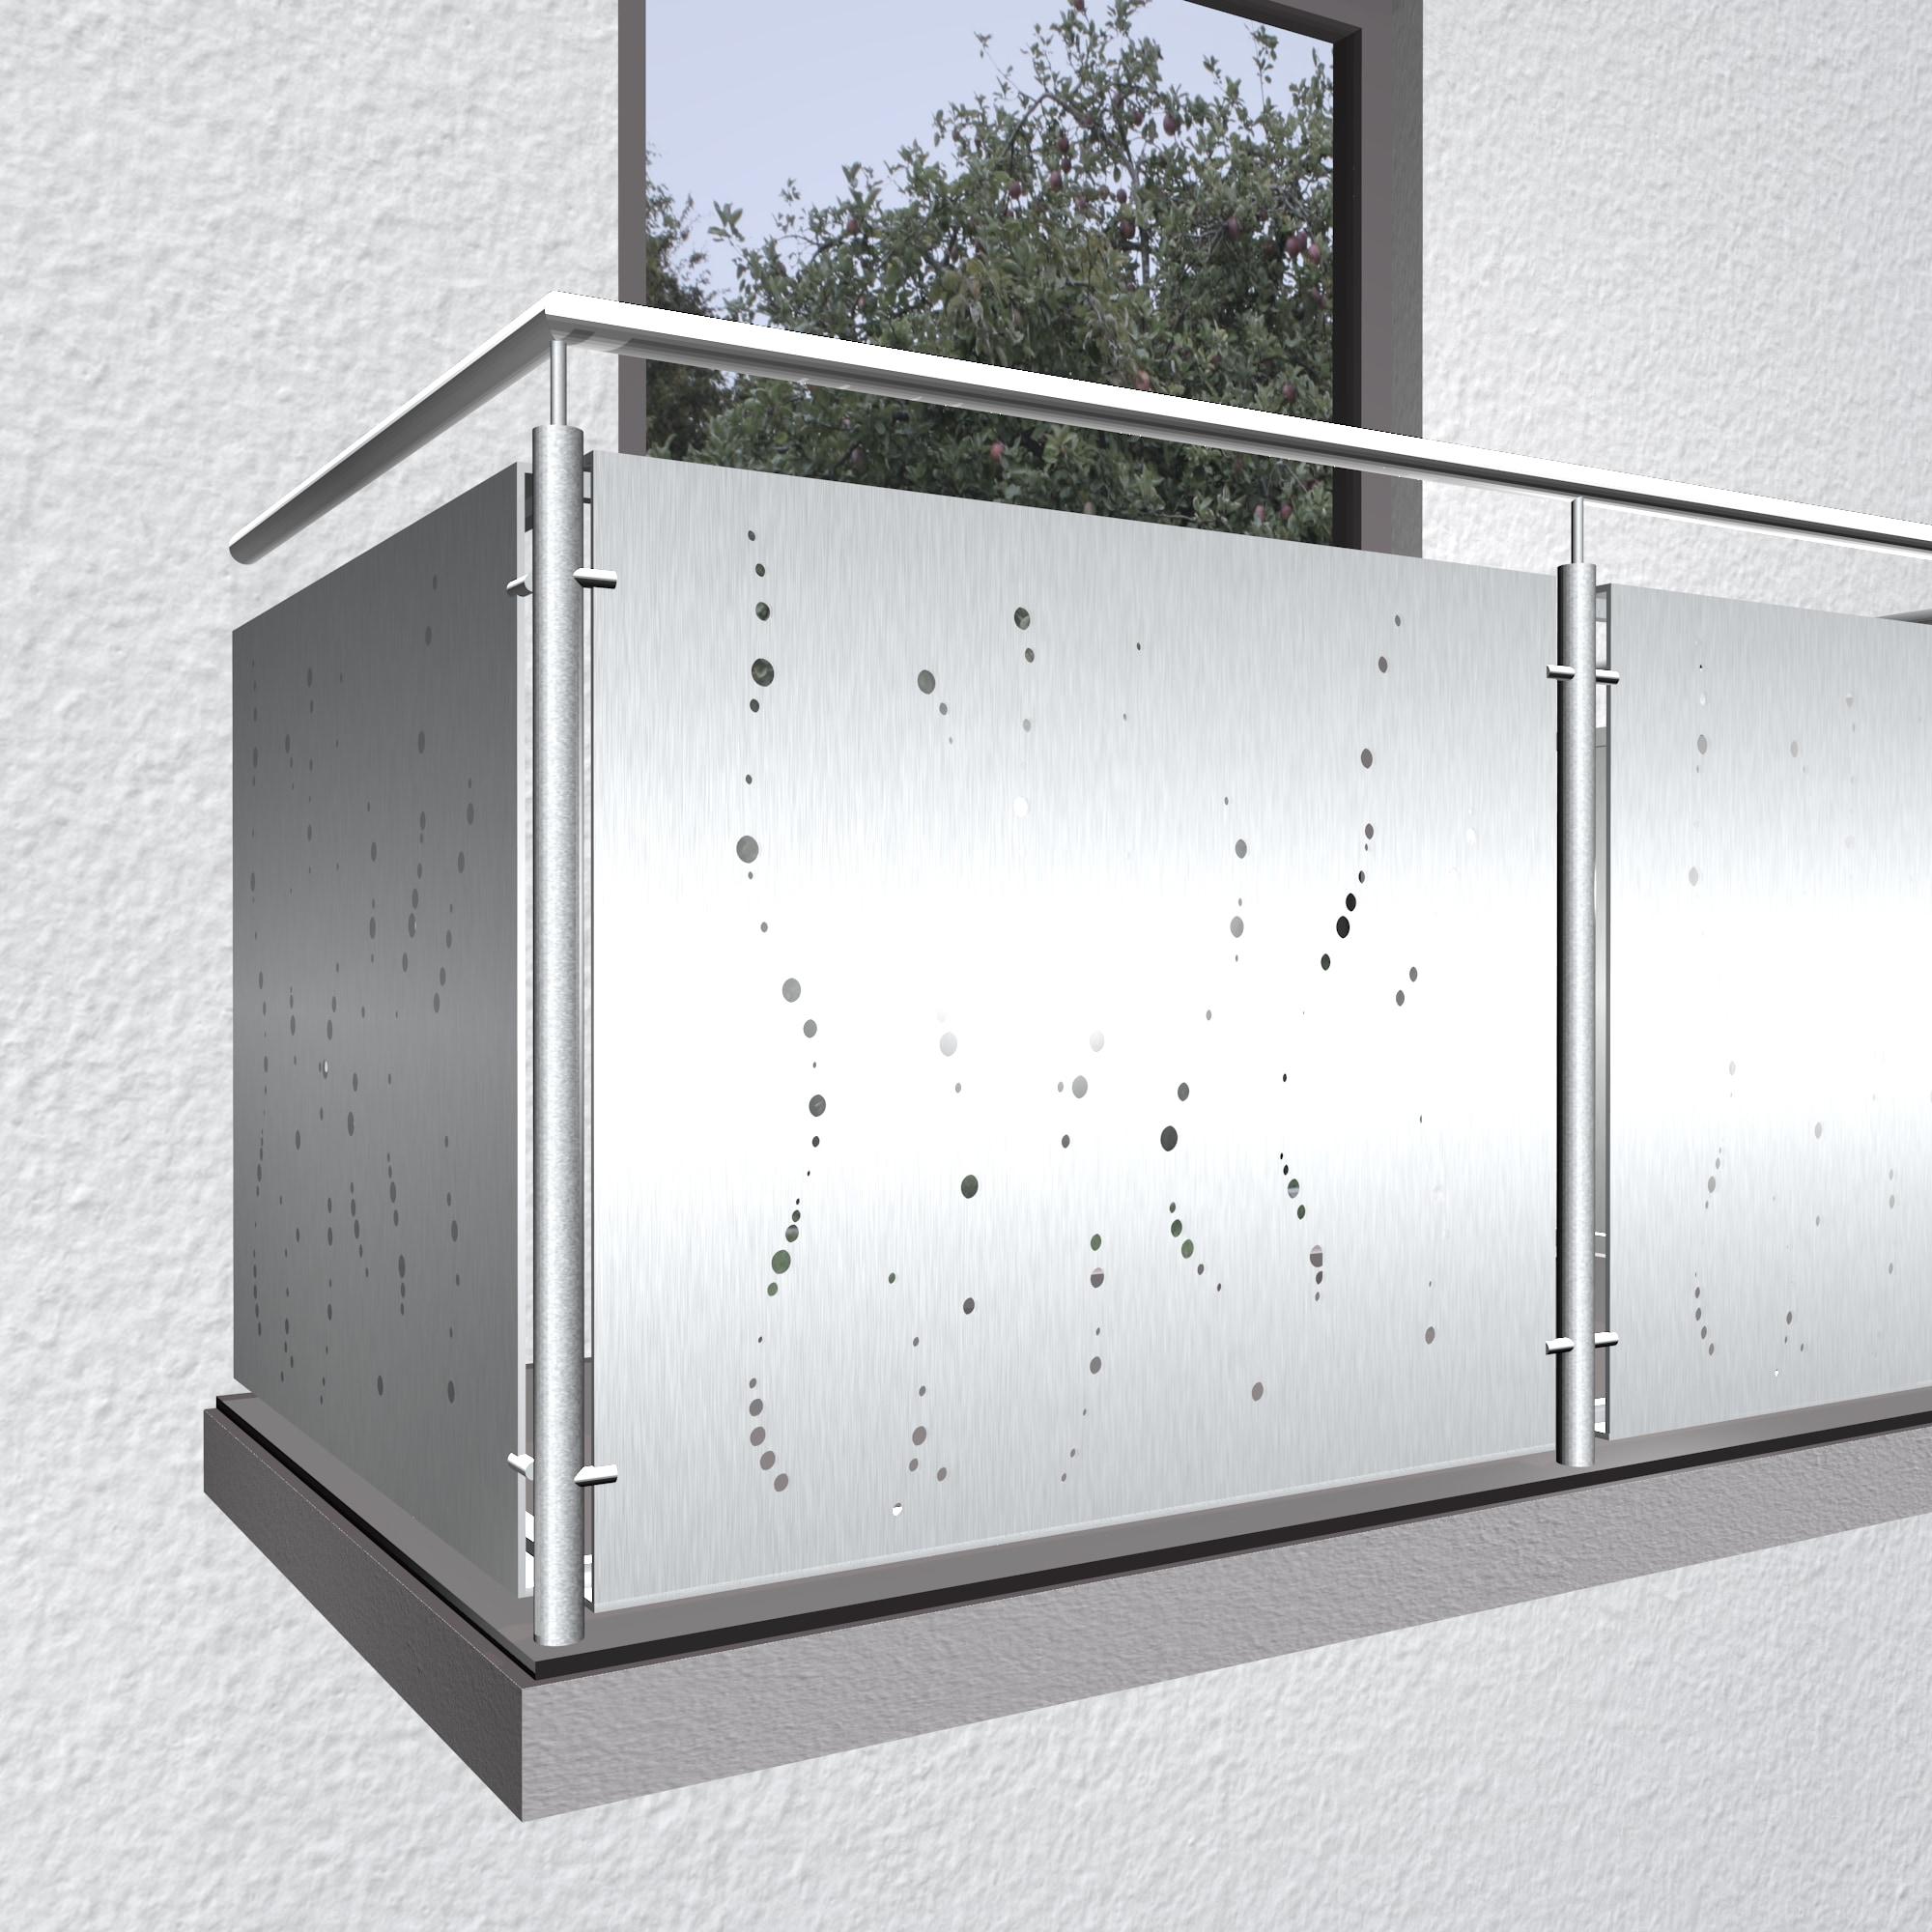 Balkonverkleidung Aluminium SB